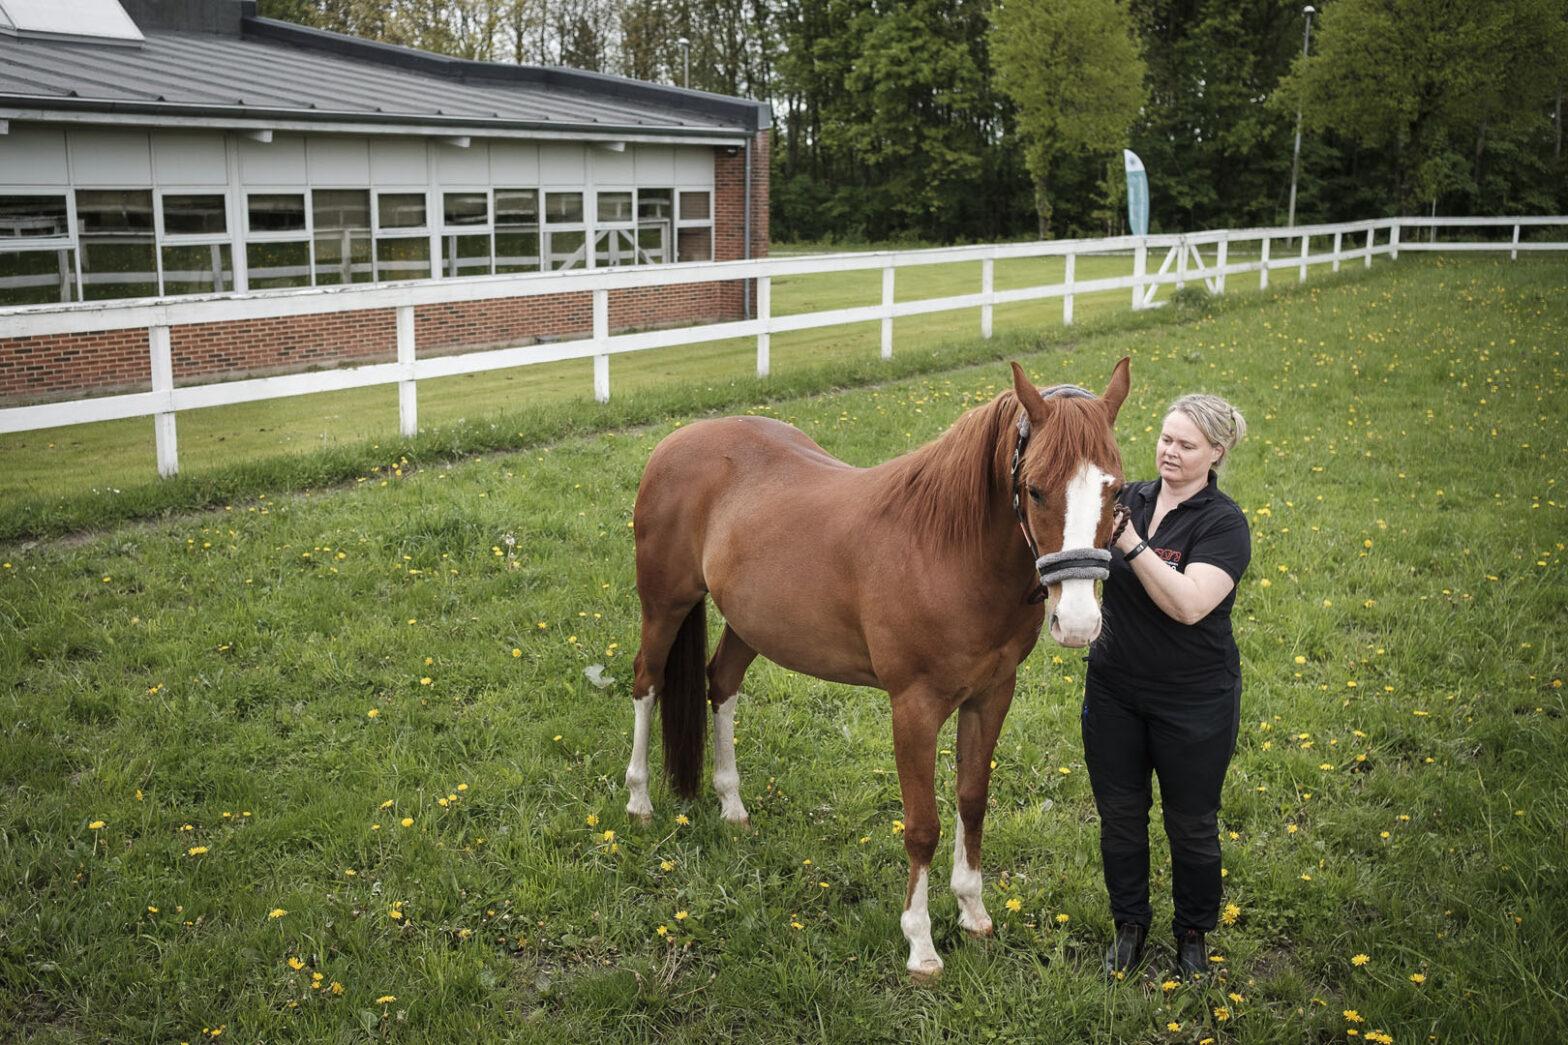 Reproduktion hos hest: Brunstkontrol, inseminering, m.m. | Dyrlægegruppen Dania